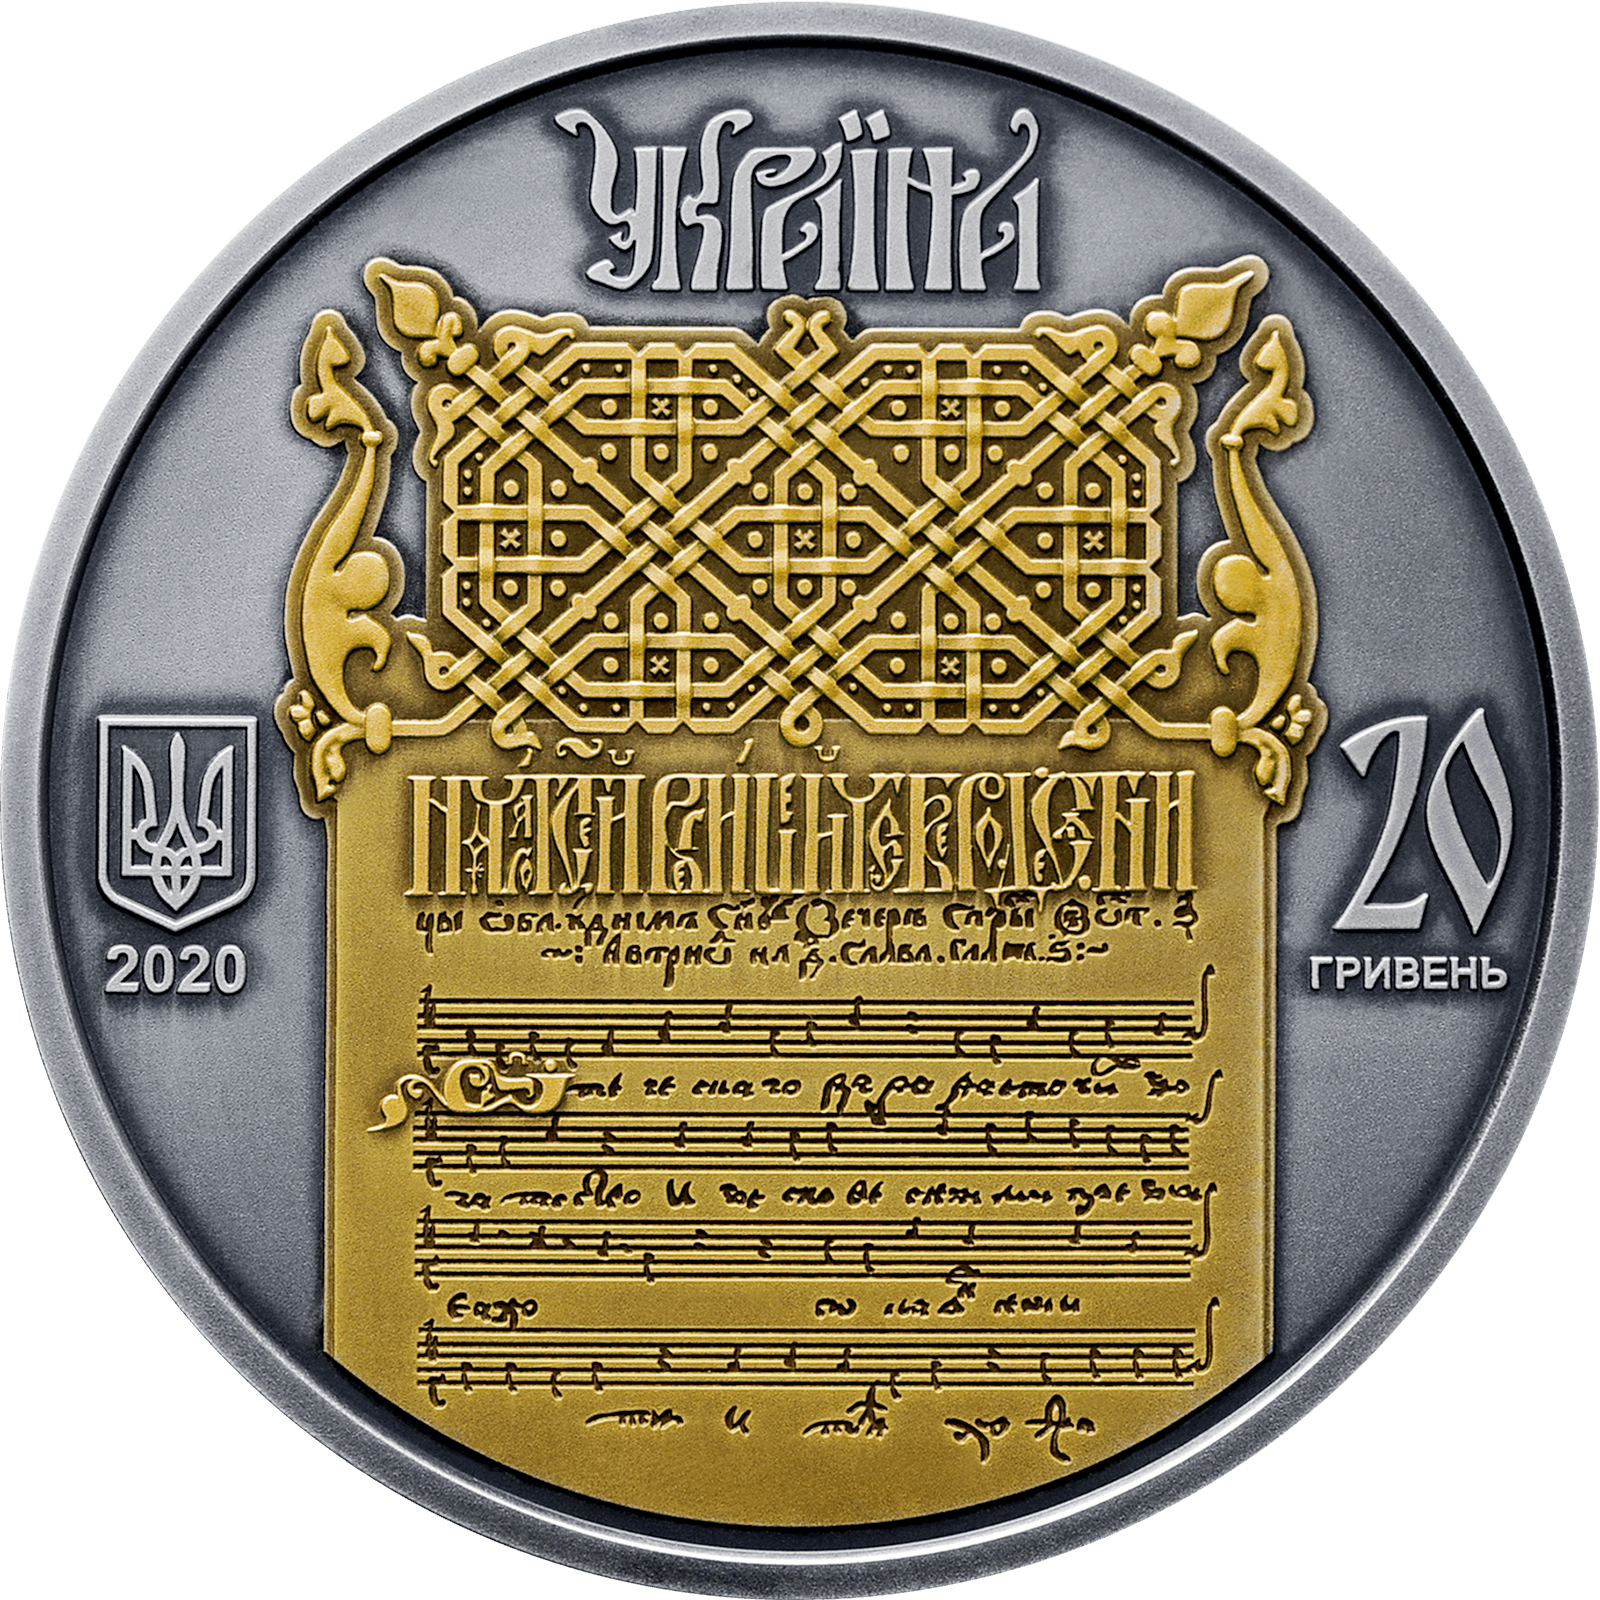 UA 20 Hryvnias 2020 National Bank of Ukraine logo